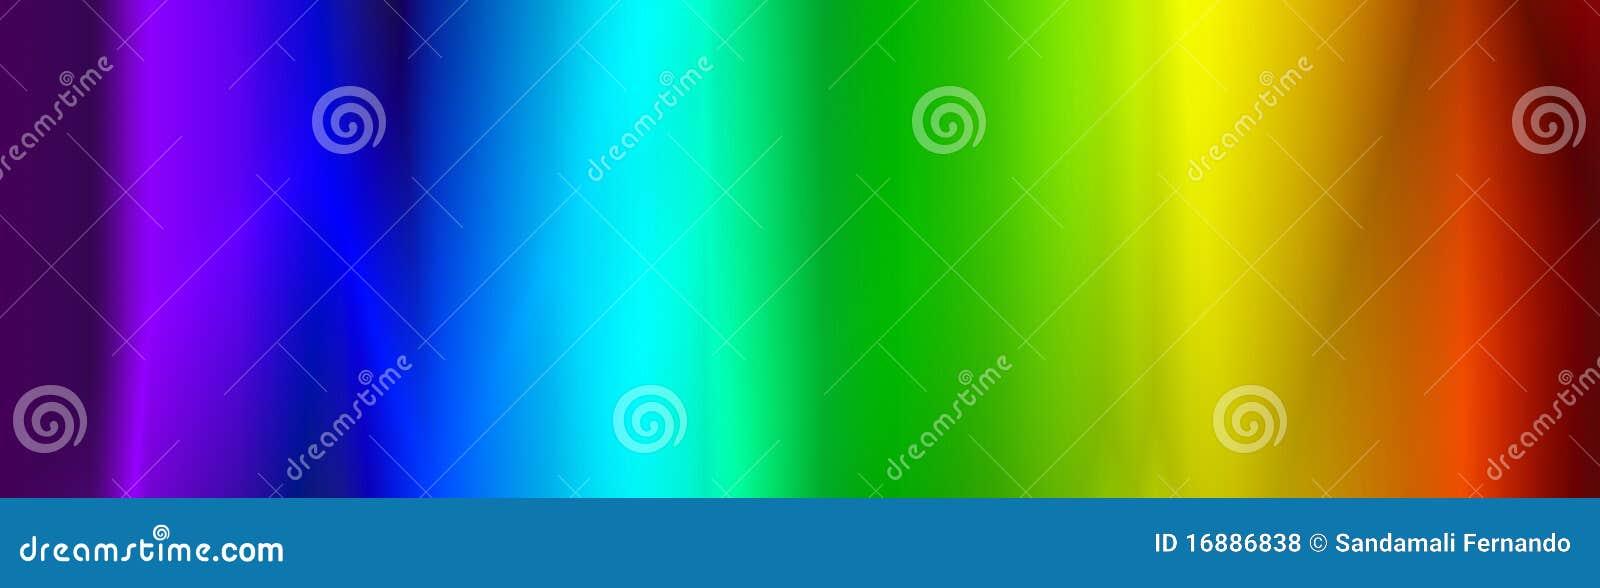 Cabecera/bandera del Web del arco iris